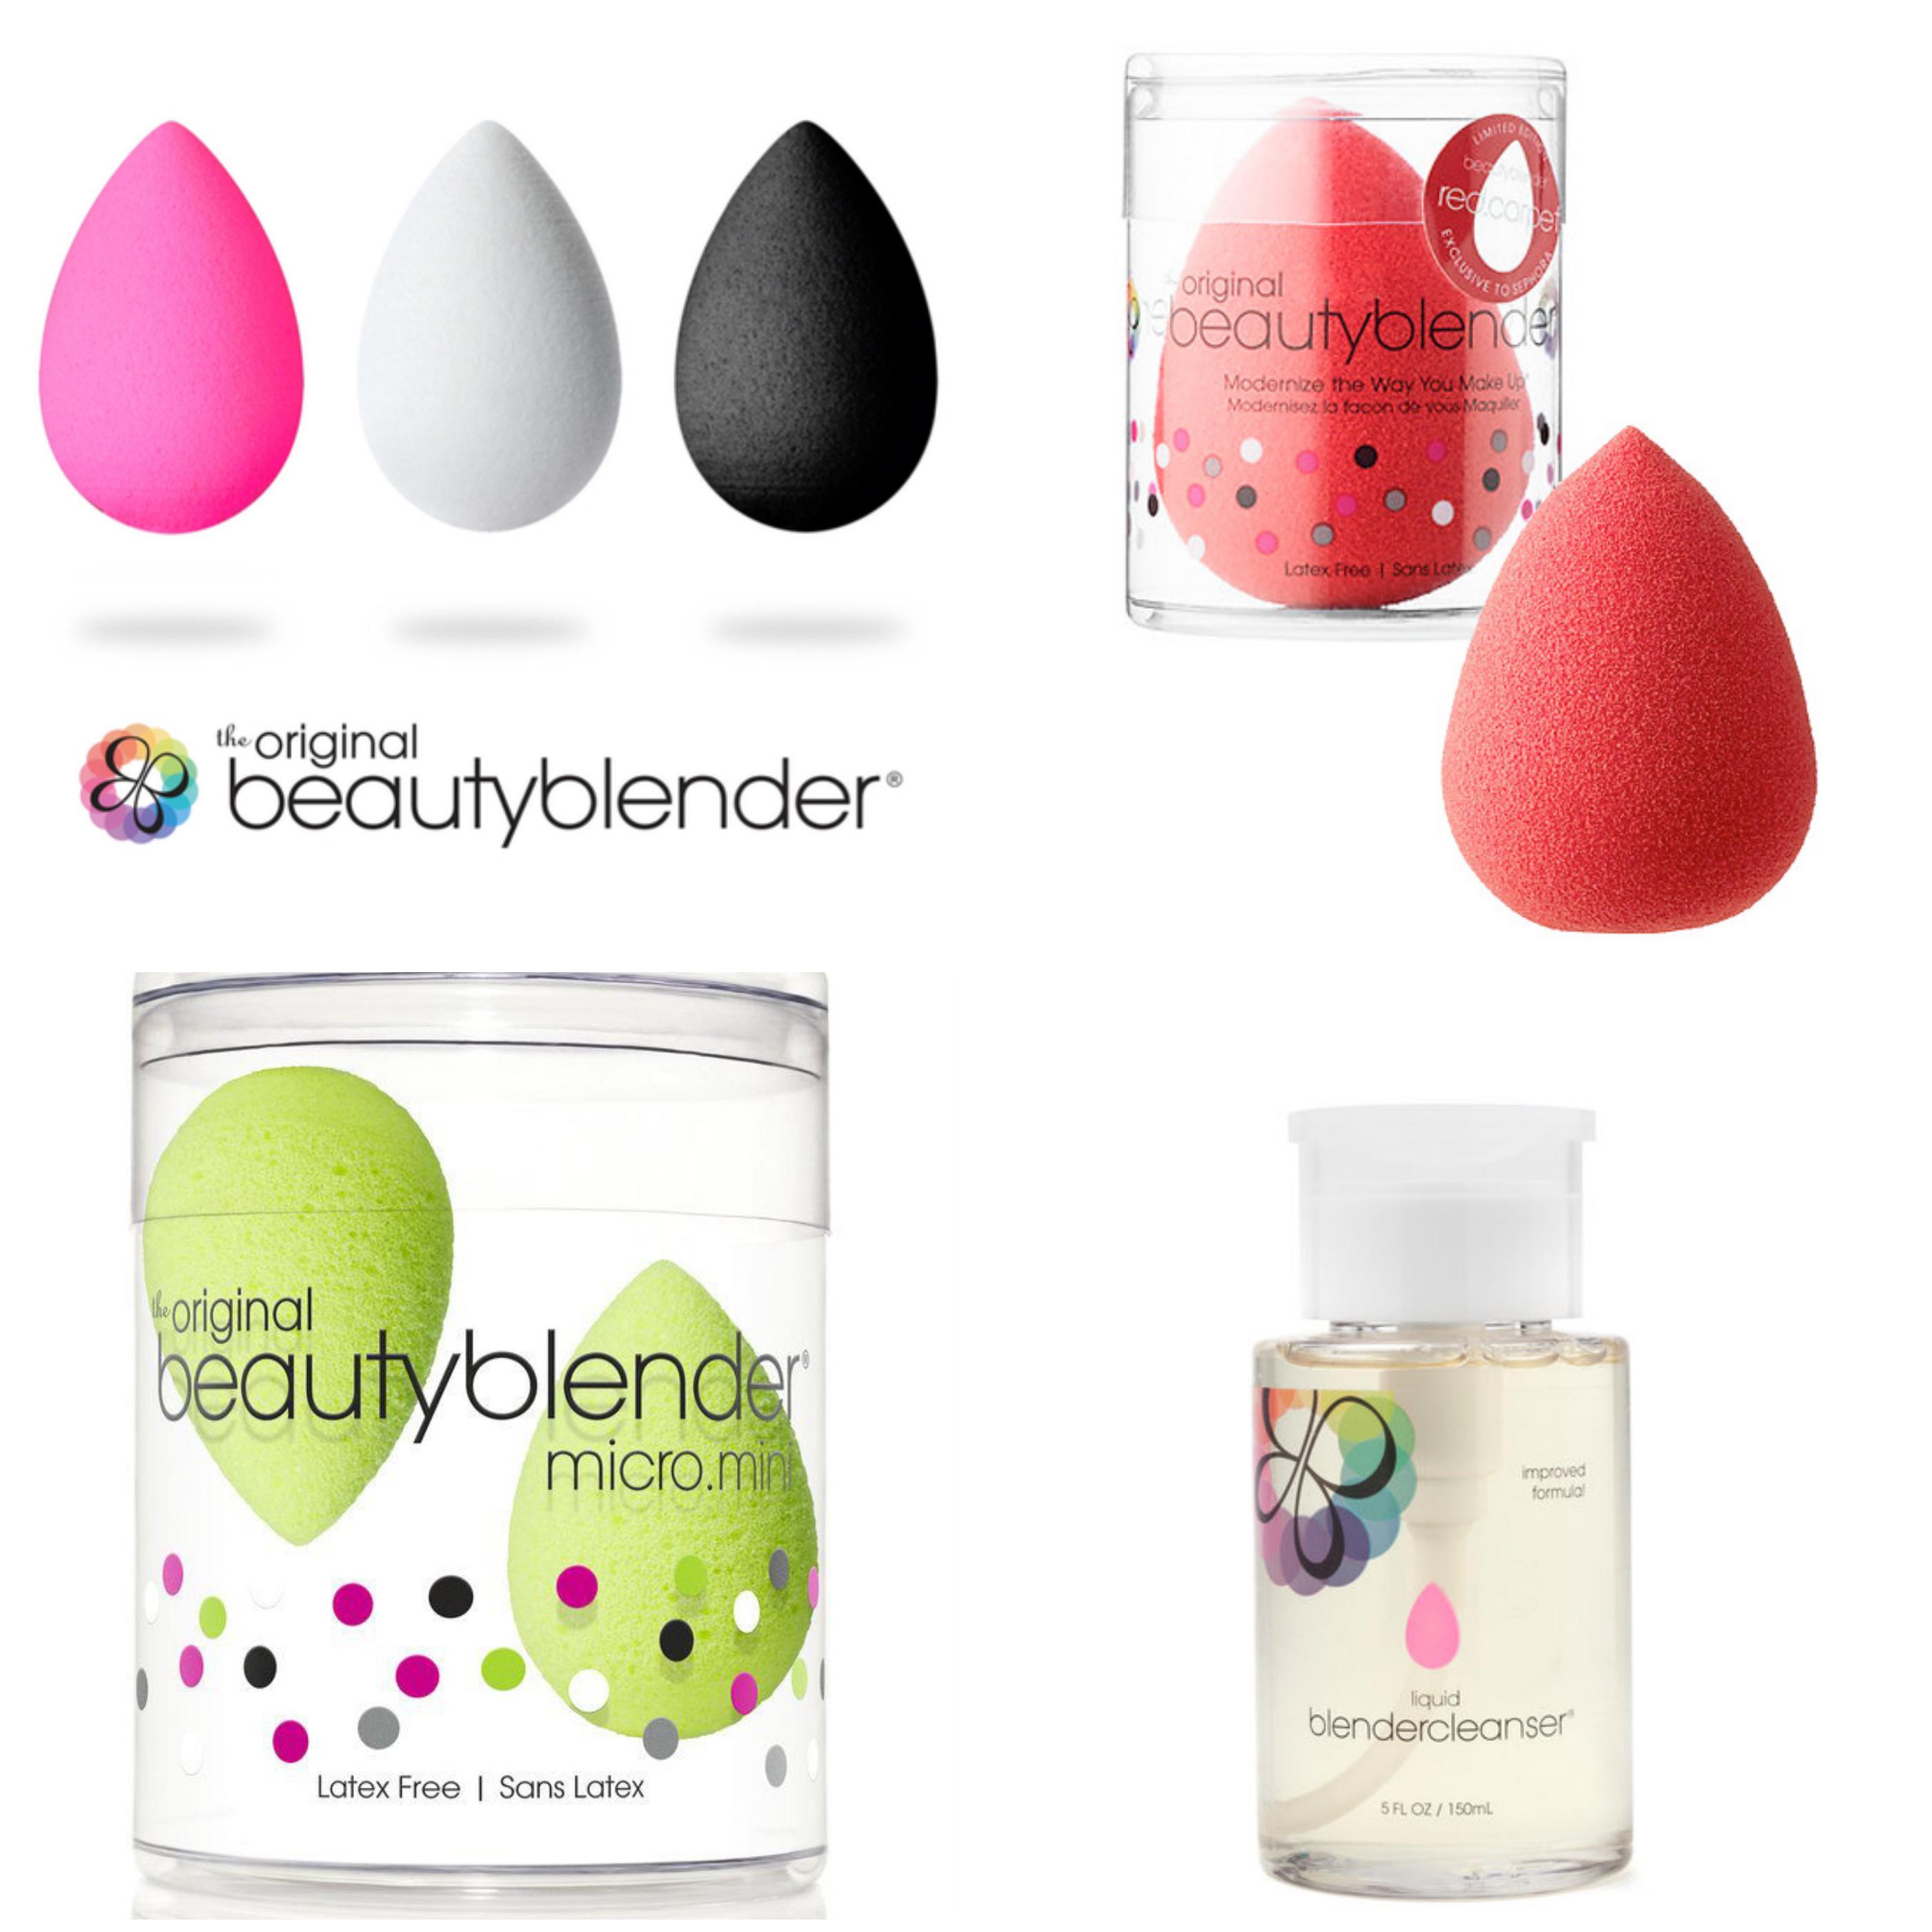 imagens-de-esponjas-beauty-blender-de-diferentes-cores1